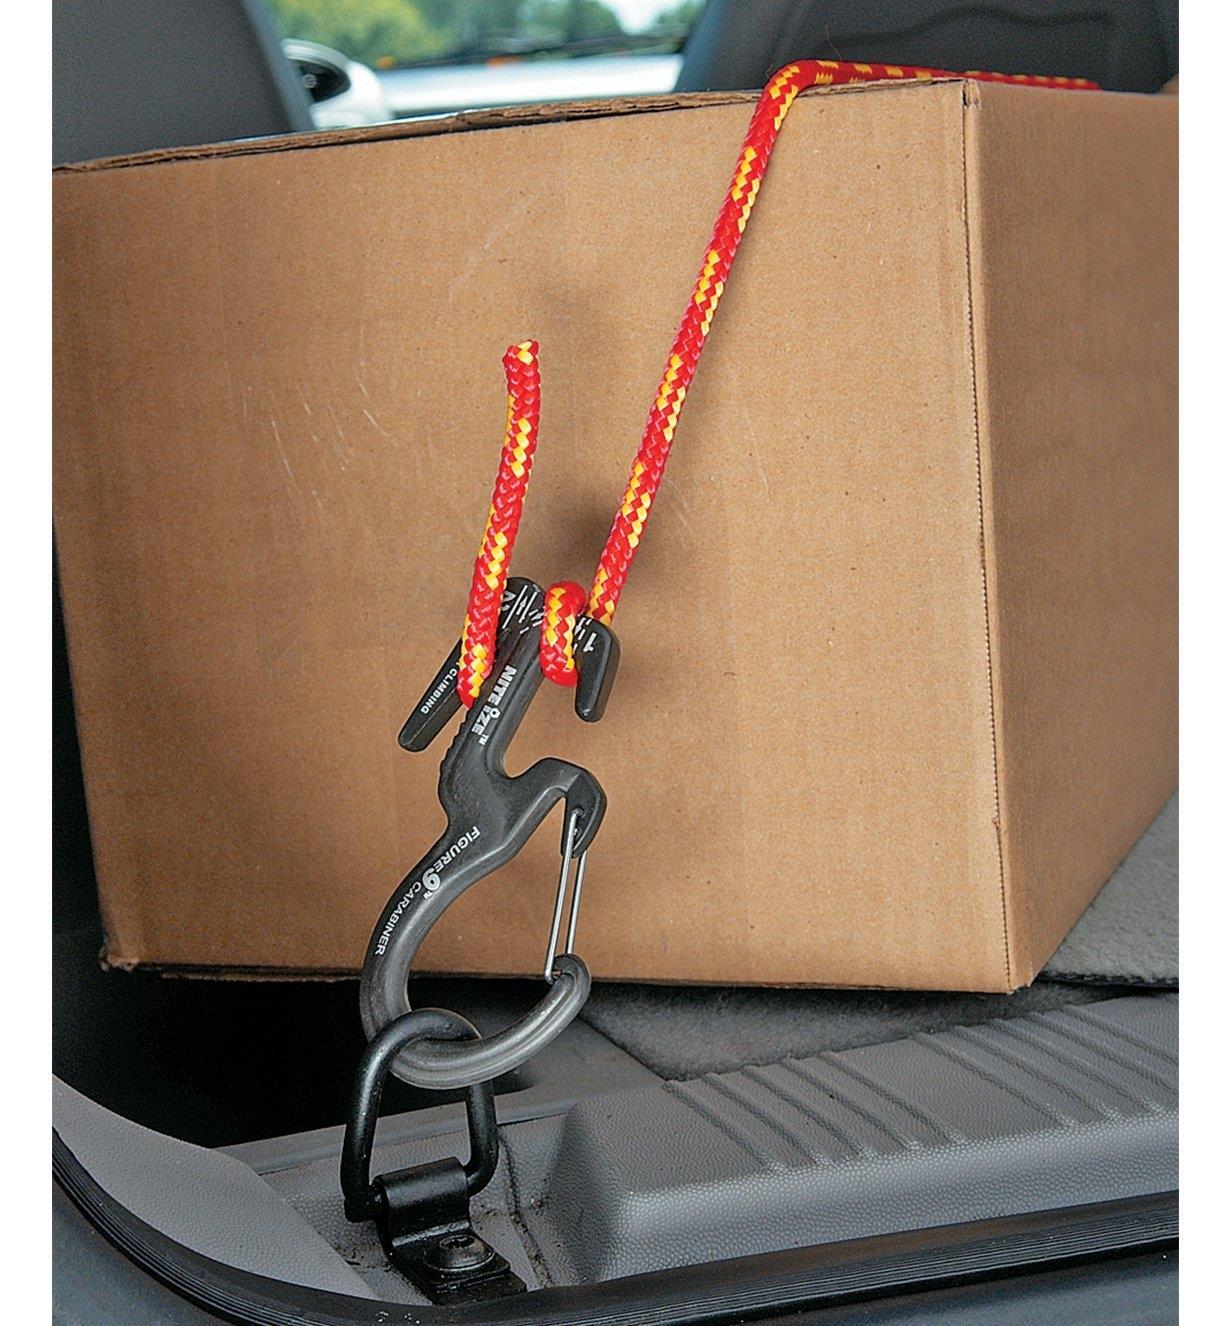 99K6962 - Figure 9 Carabiner & MFP Rope